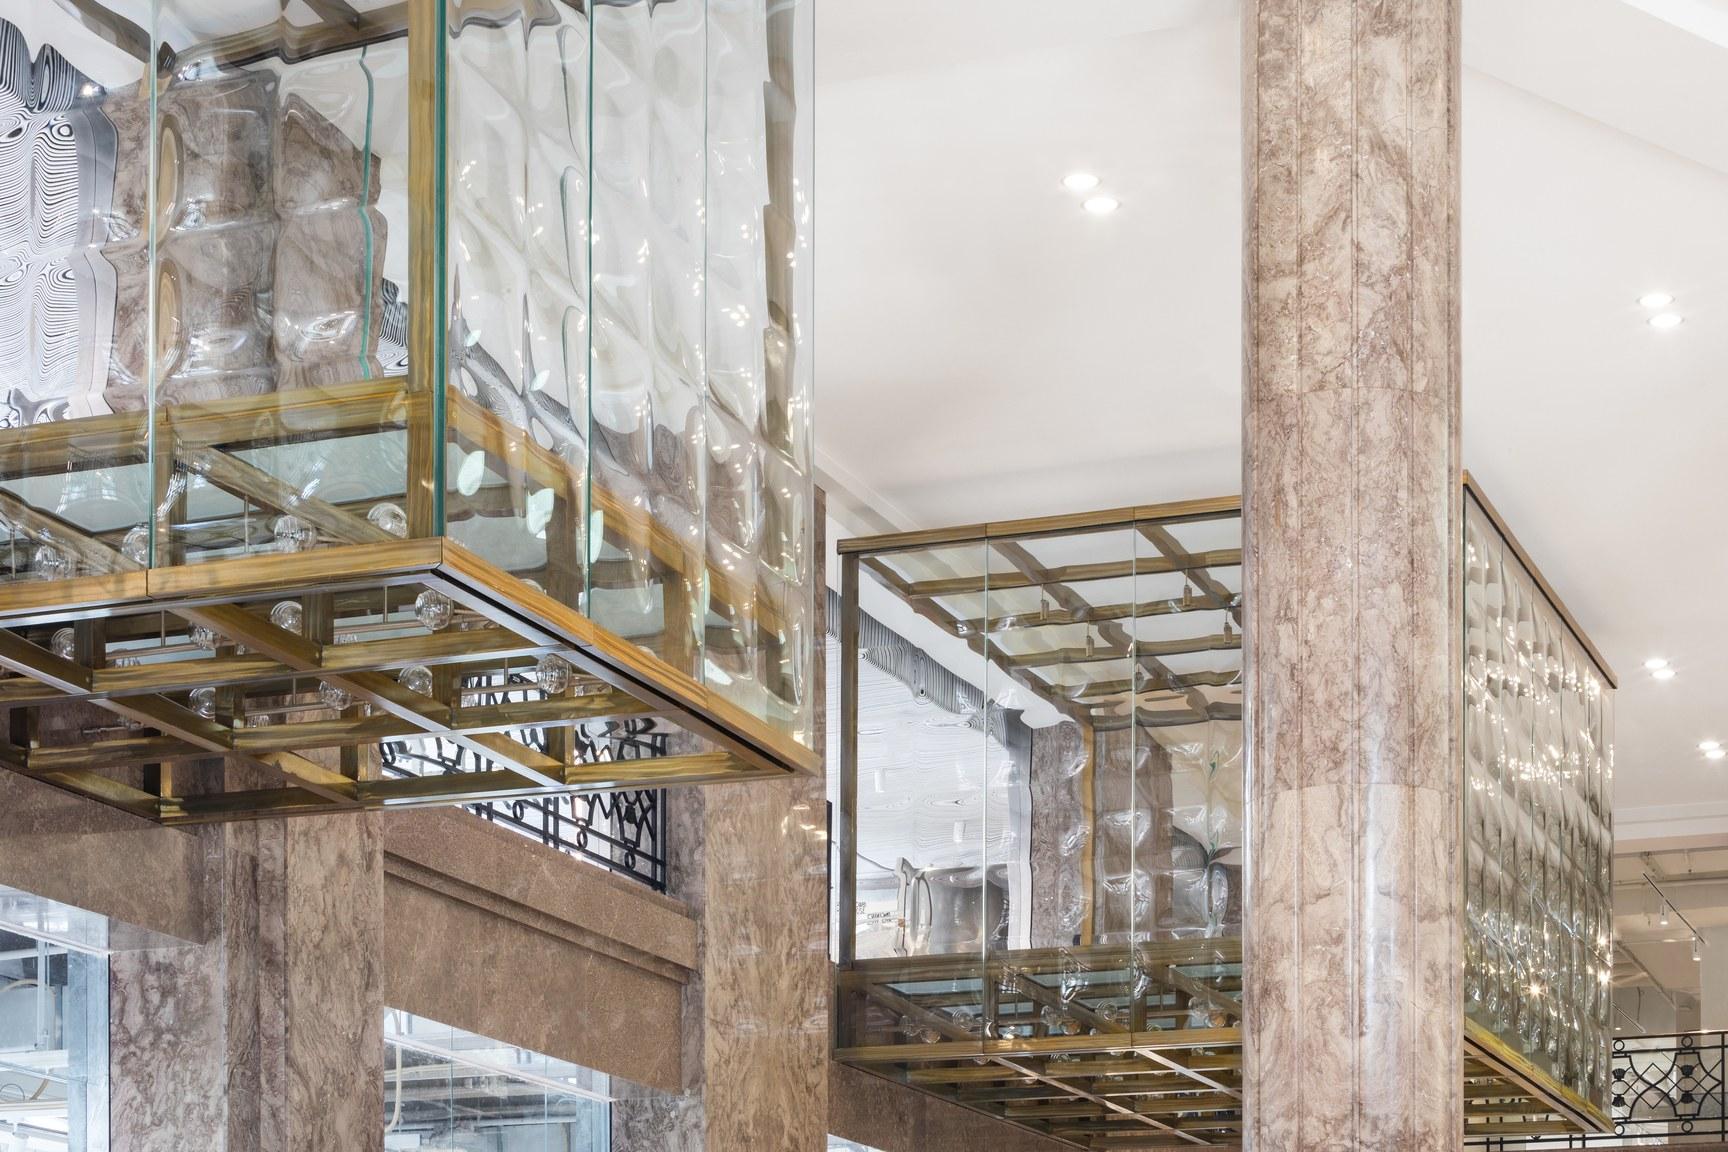 Galeries Lafayette Champs-Elysées - Boîtes de verre - mars 2019 (c) Delfino Sisto Legnani e Marco Cappelletti